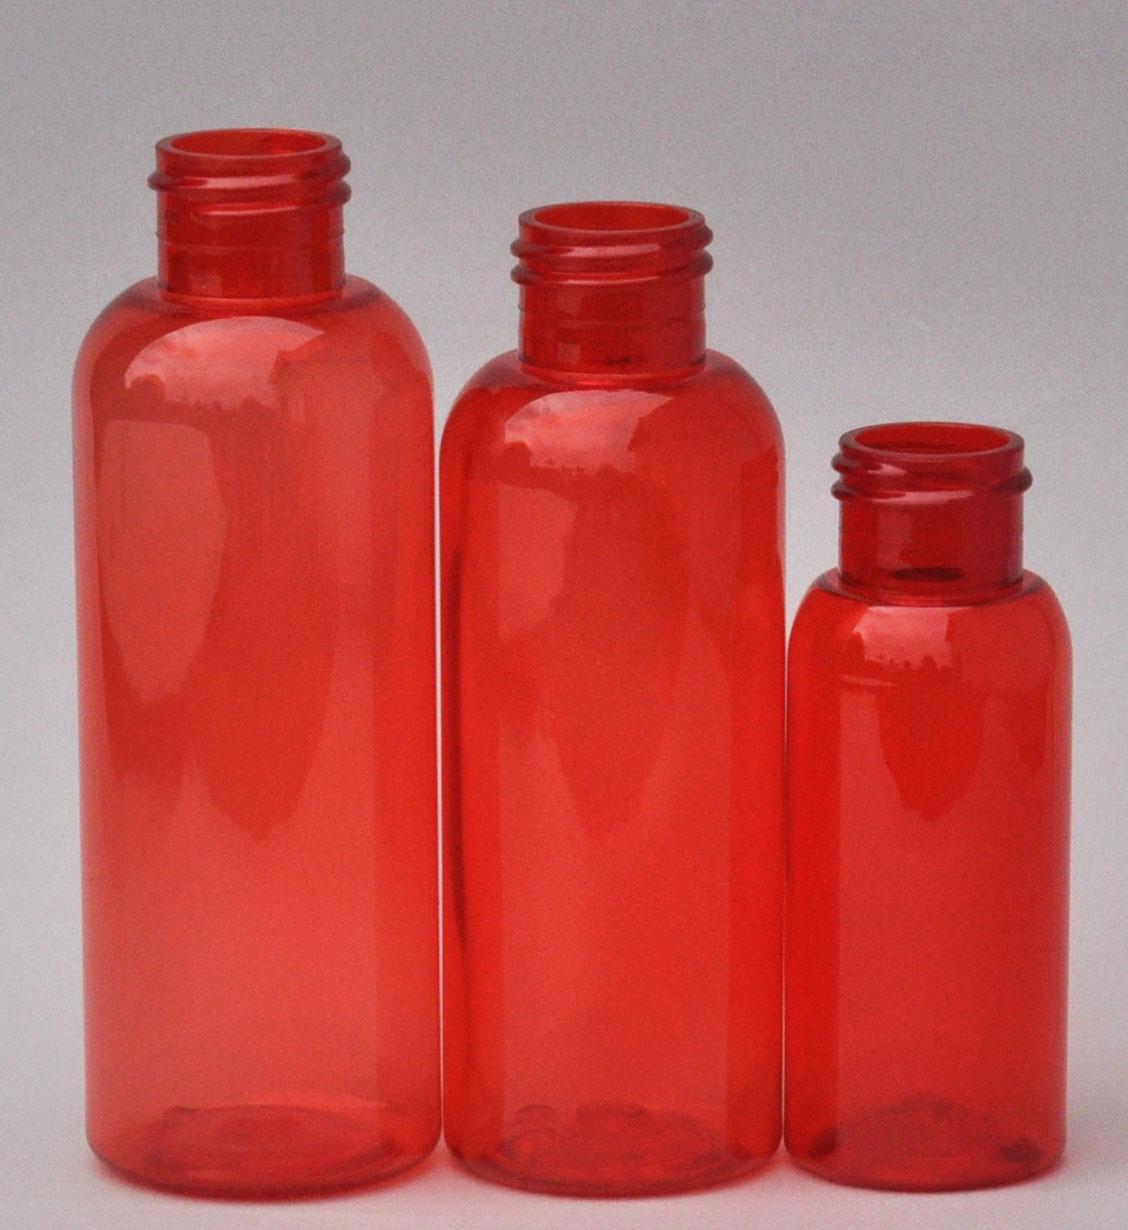 SNEP-100BPETR-100ml Red PET Boston Bottle with 24/410 Neck